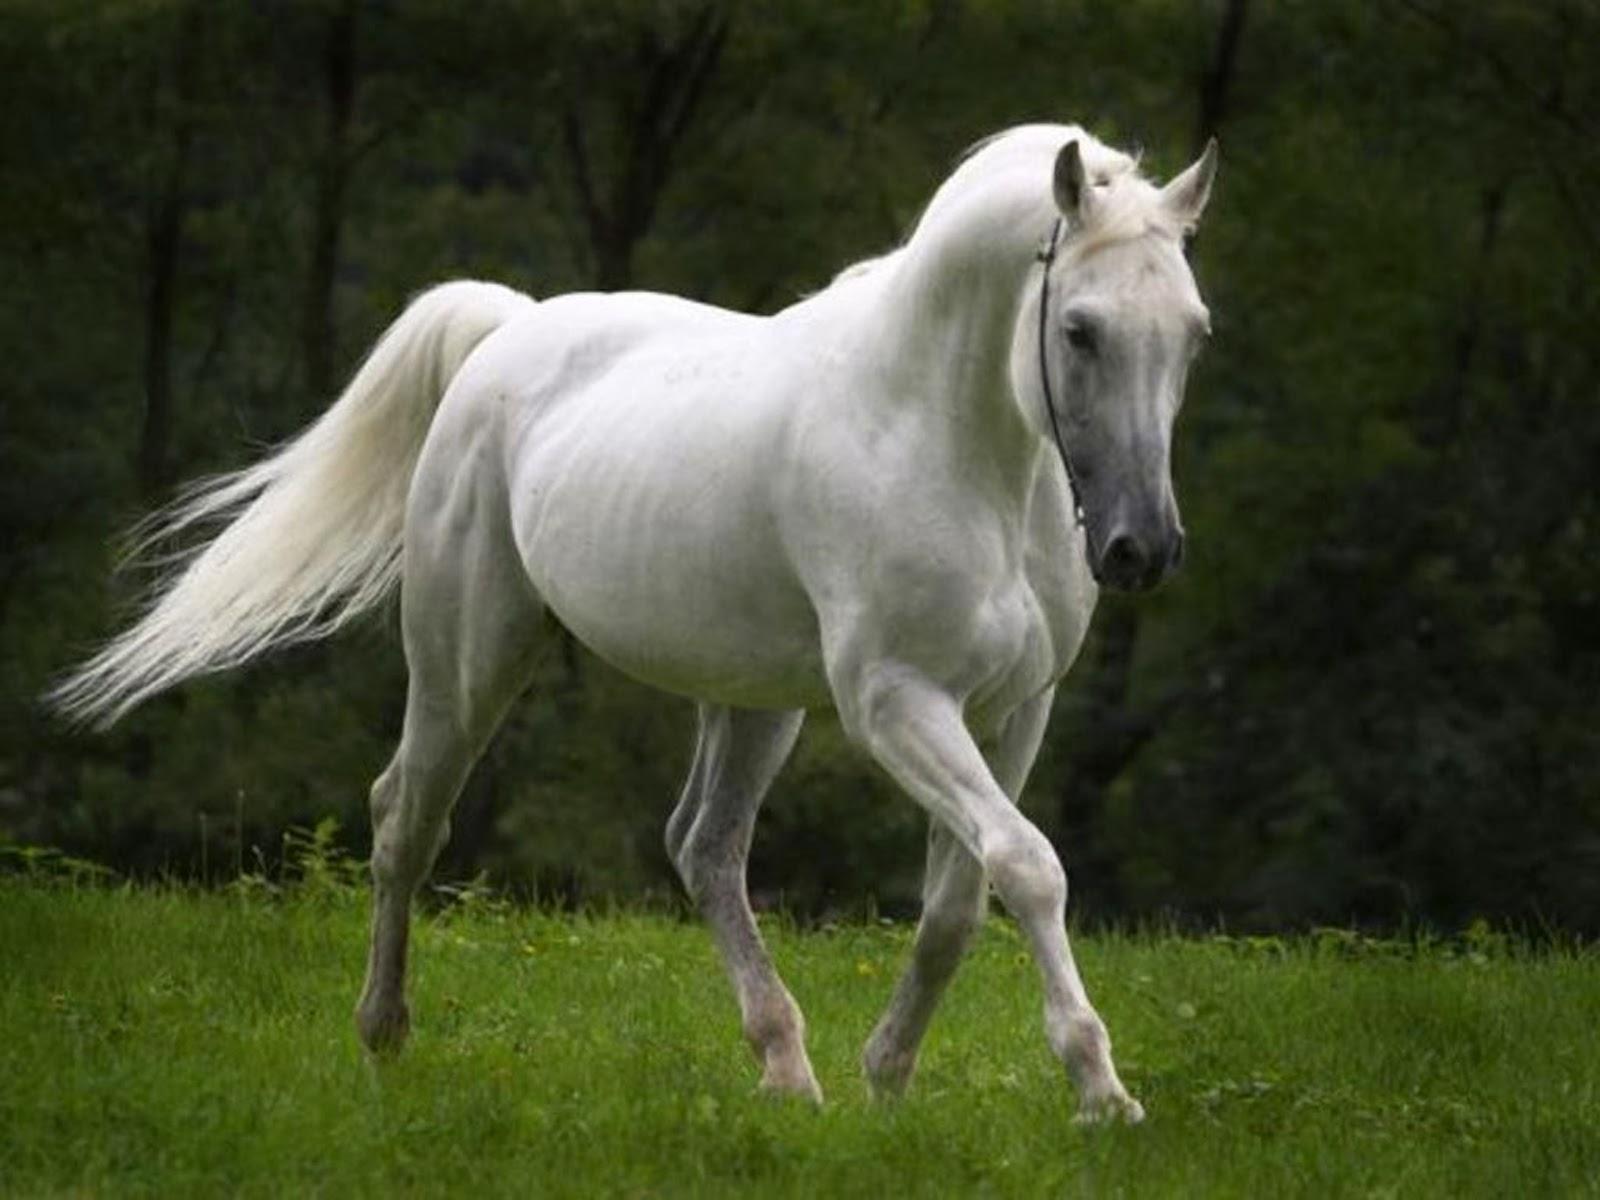 Wildlife Hd Wallpapers: Beautiful Horses HD Wallpapers 2014